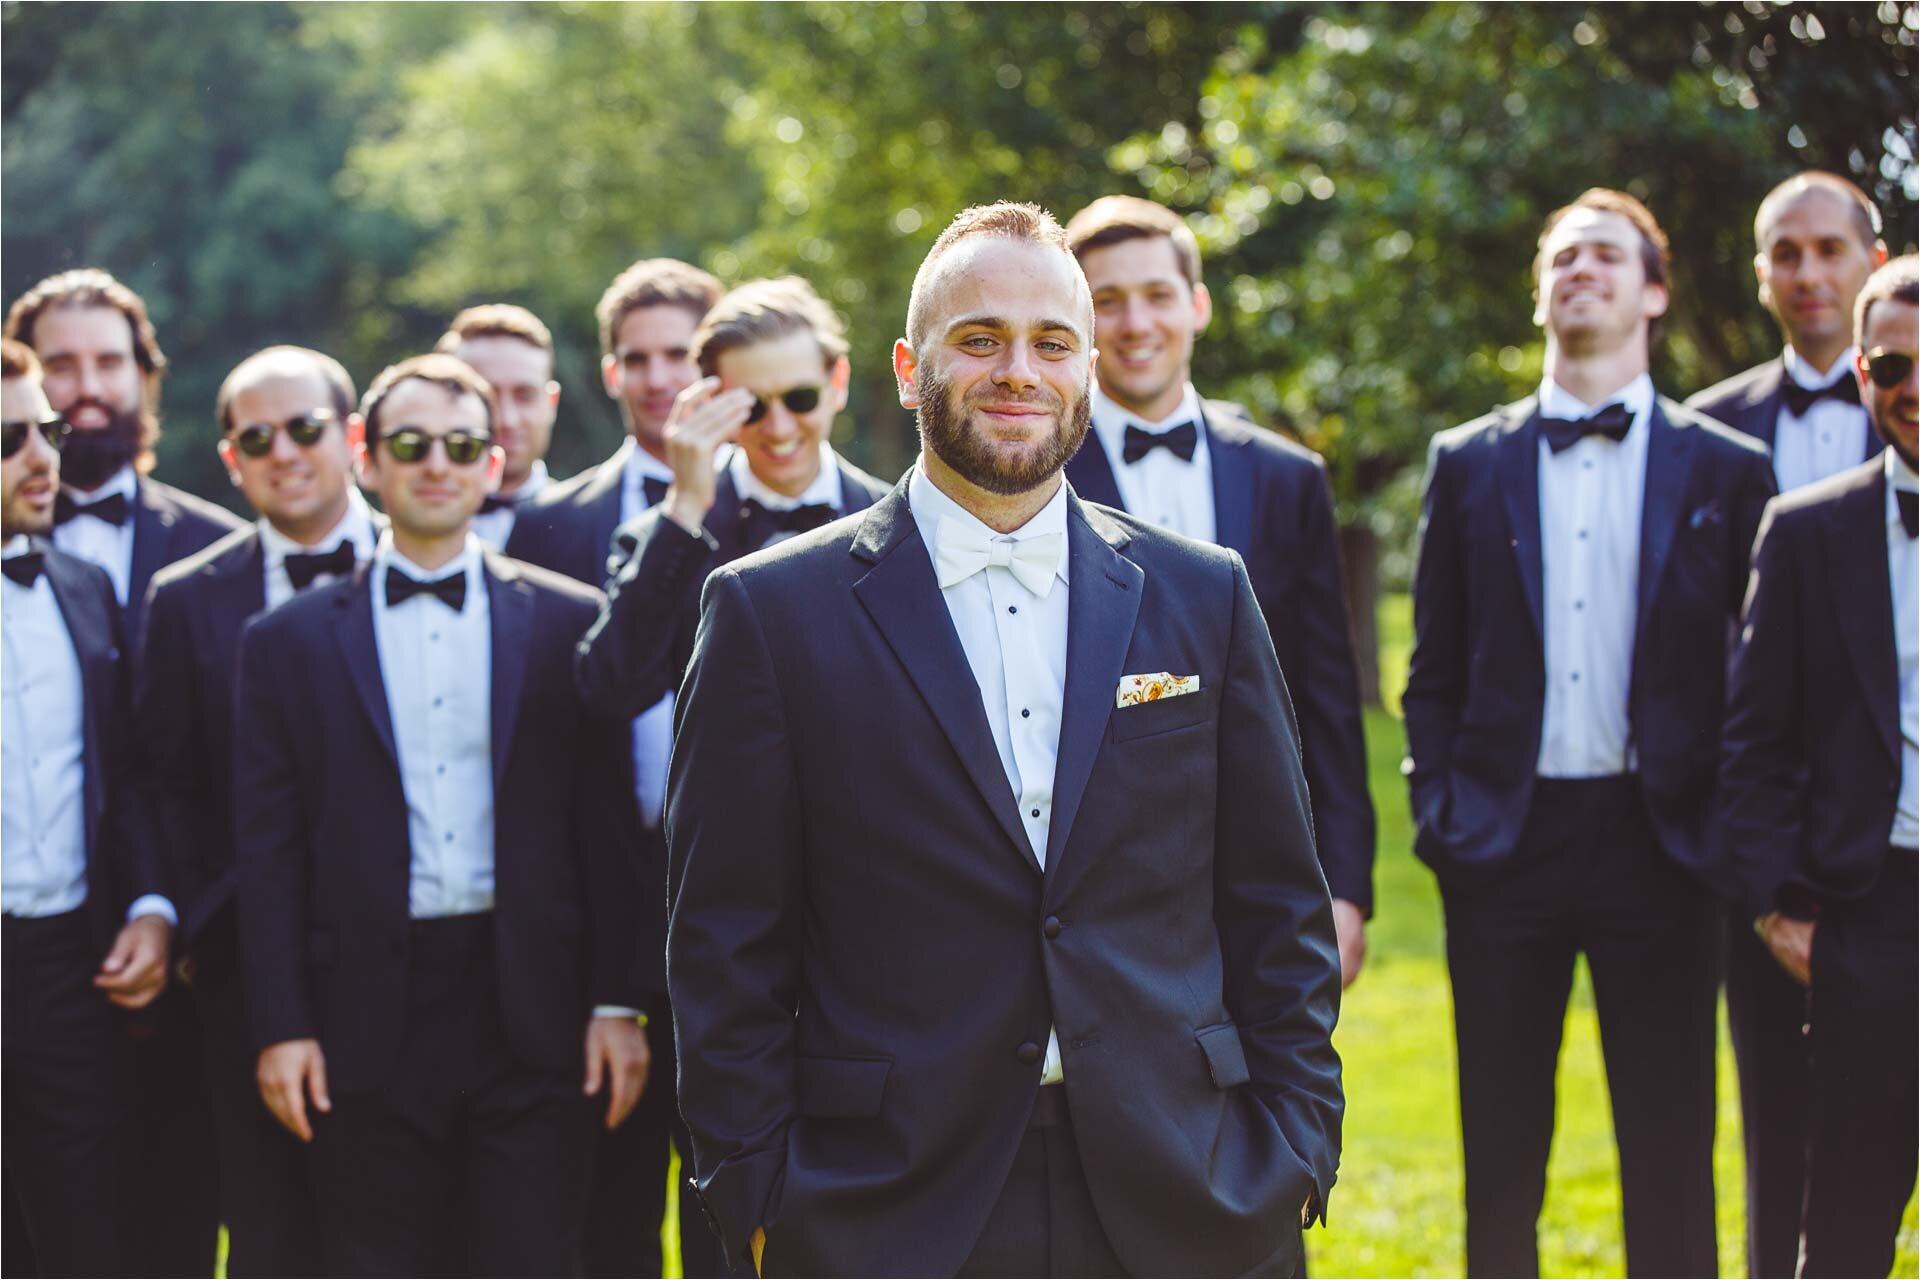 racebrook-countryclub-wedding-photography-05.jpg